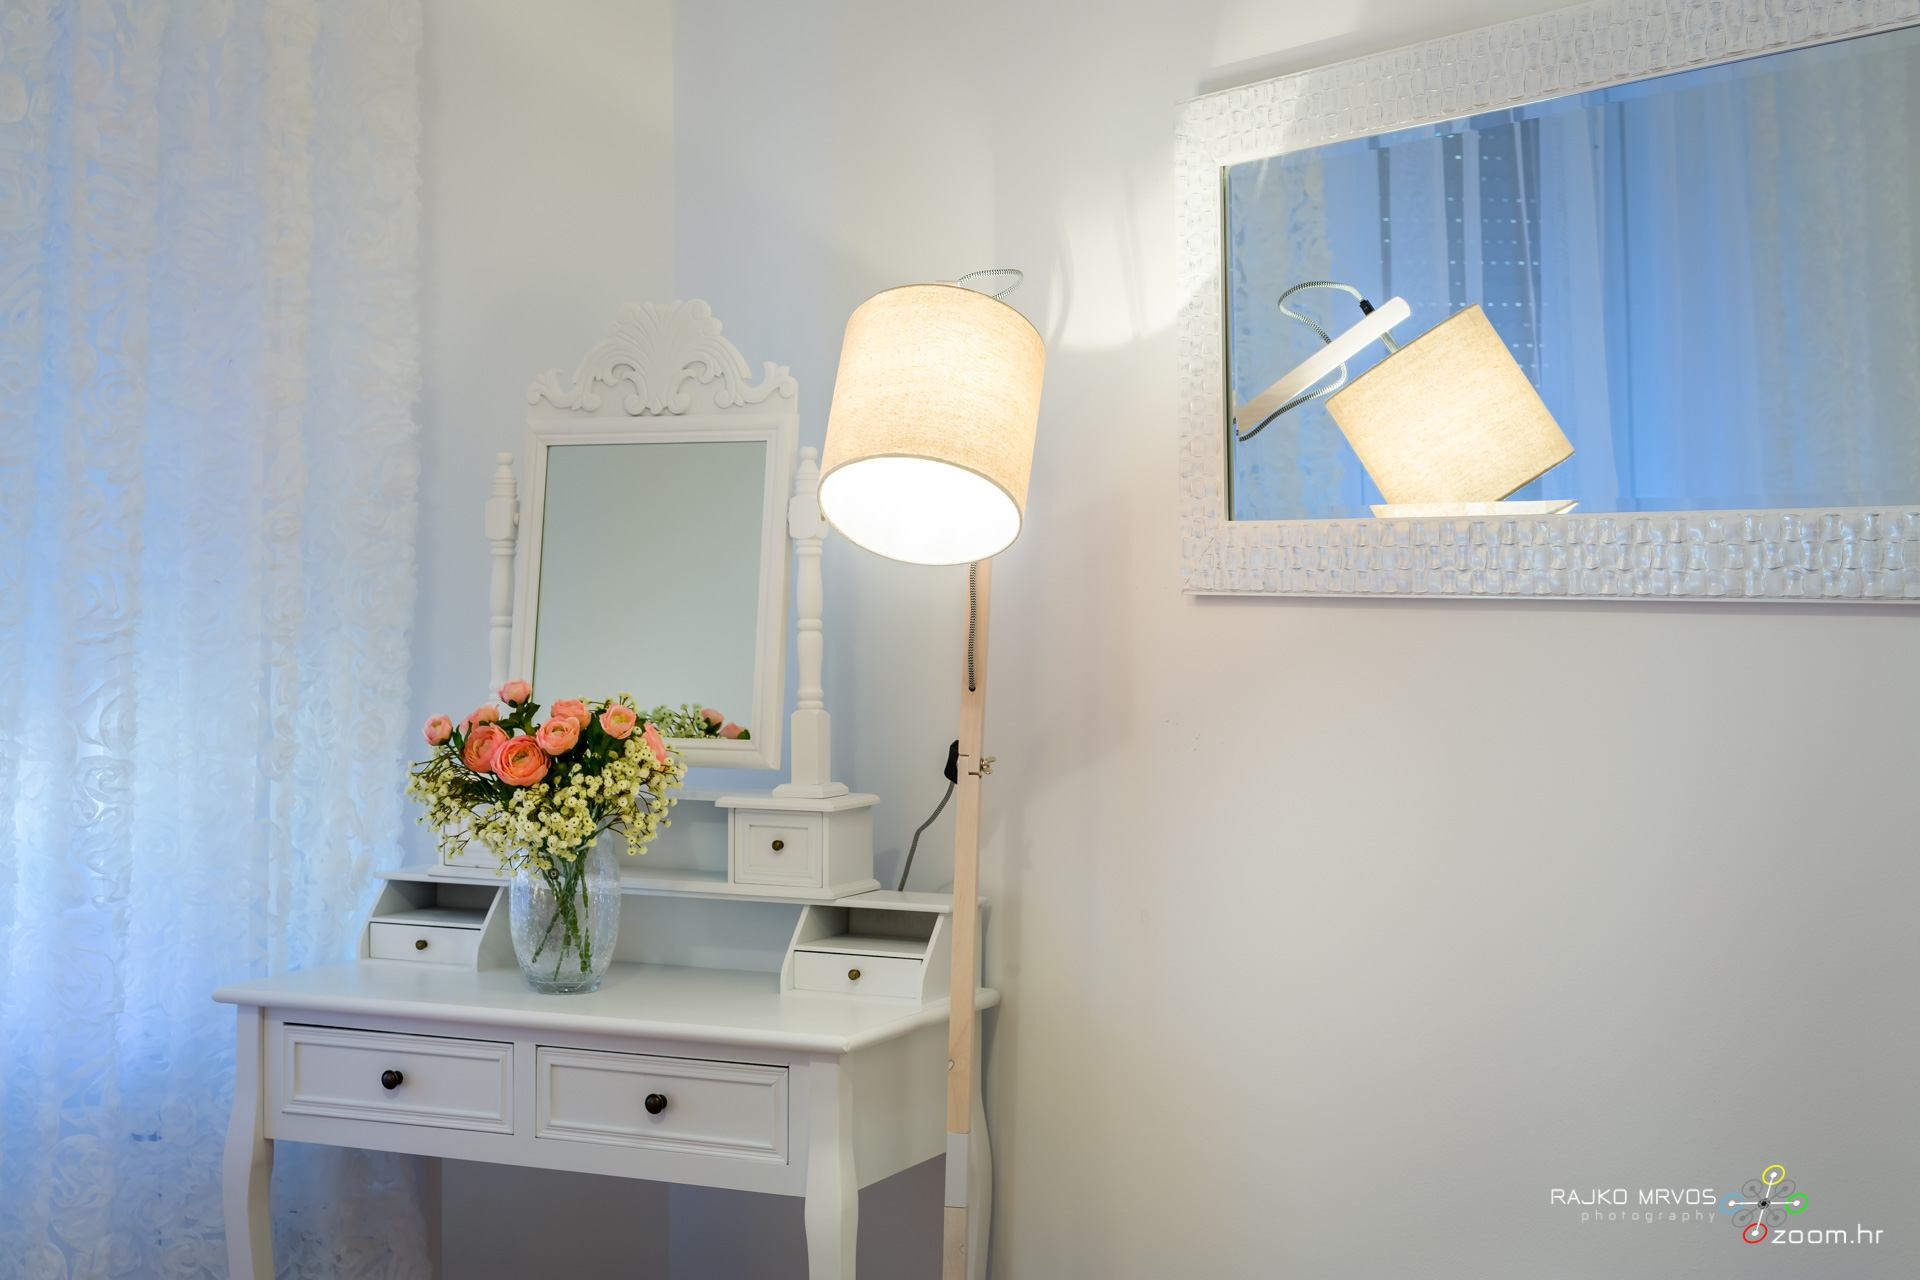 fotografiranje-interijera-fotograf-apartmana-vila-kuca-hotela-apartman-Gabby-Rijeka-42